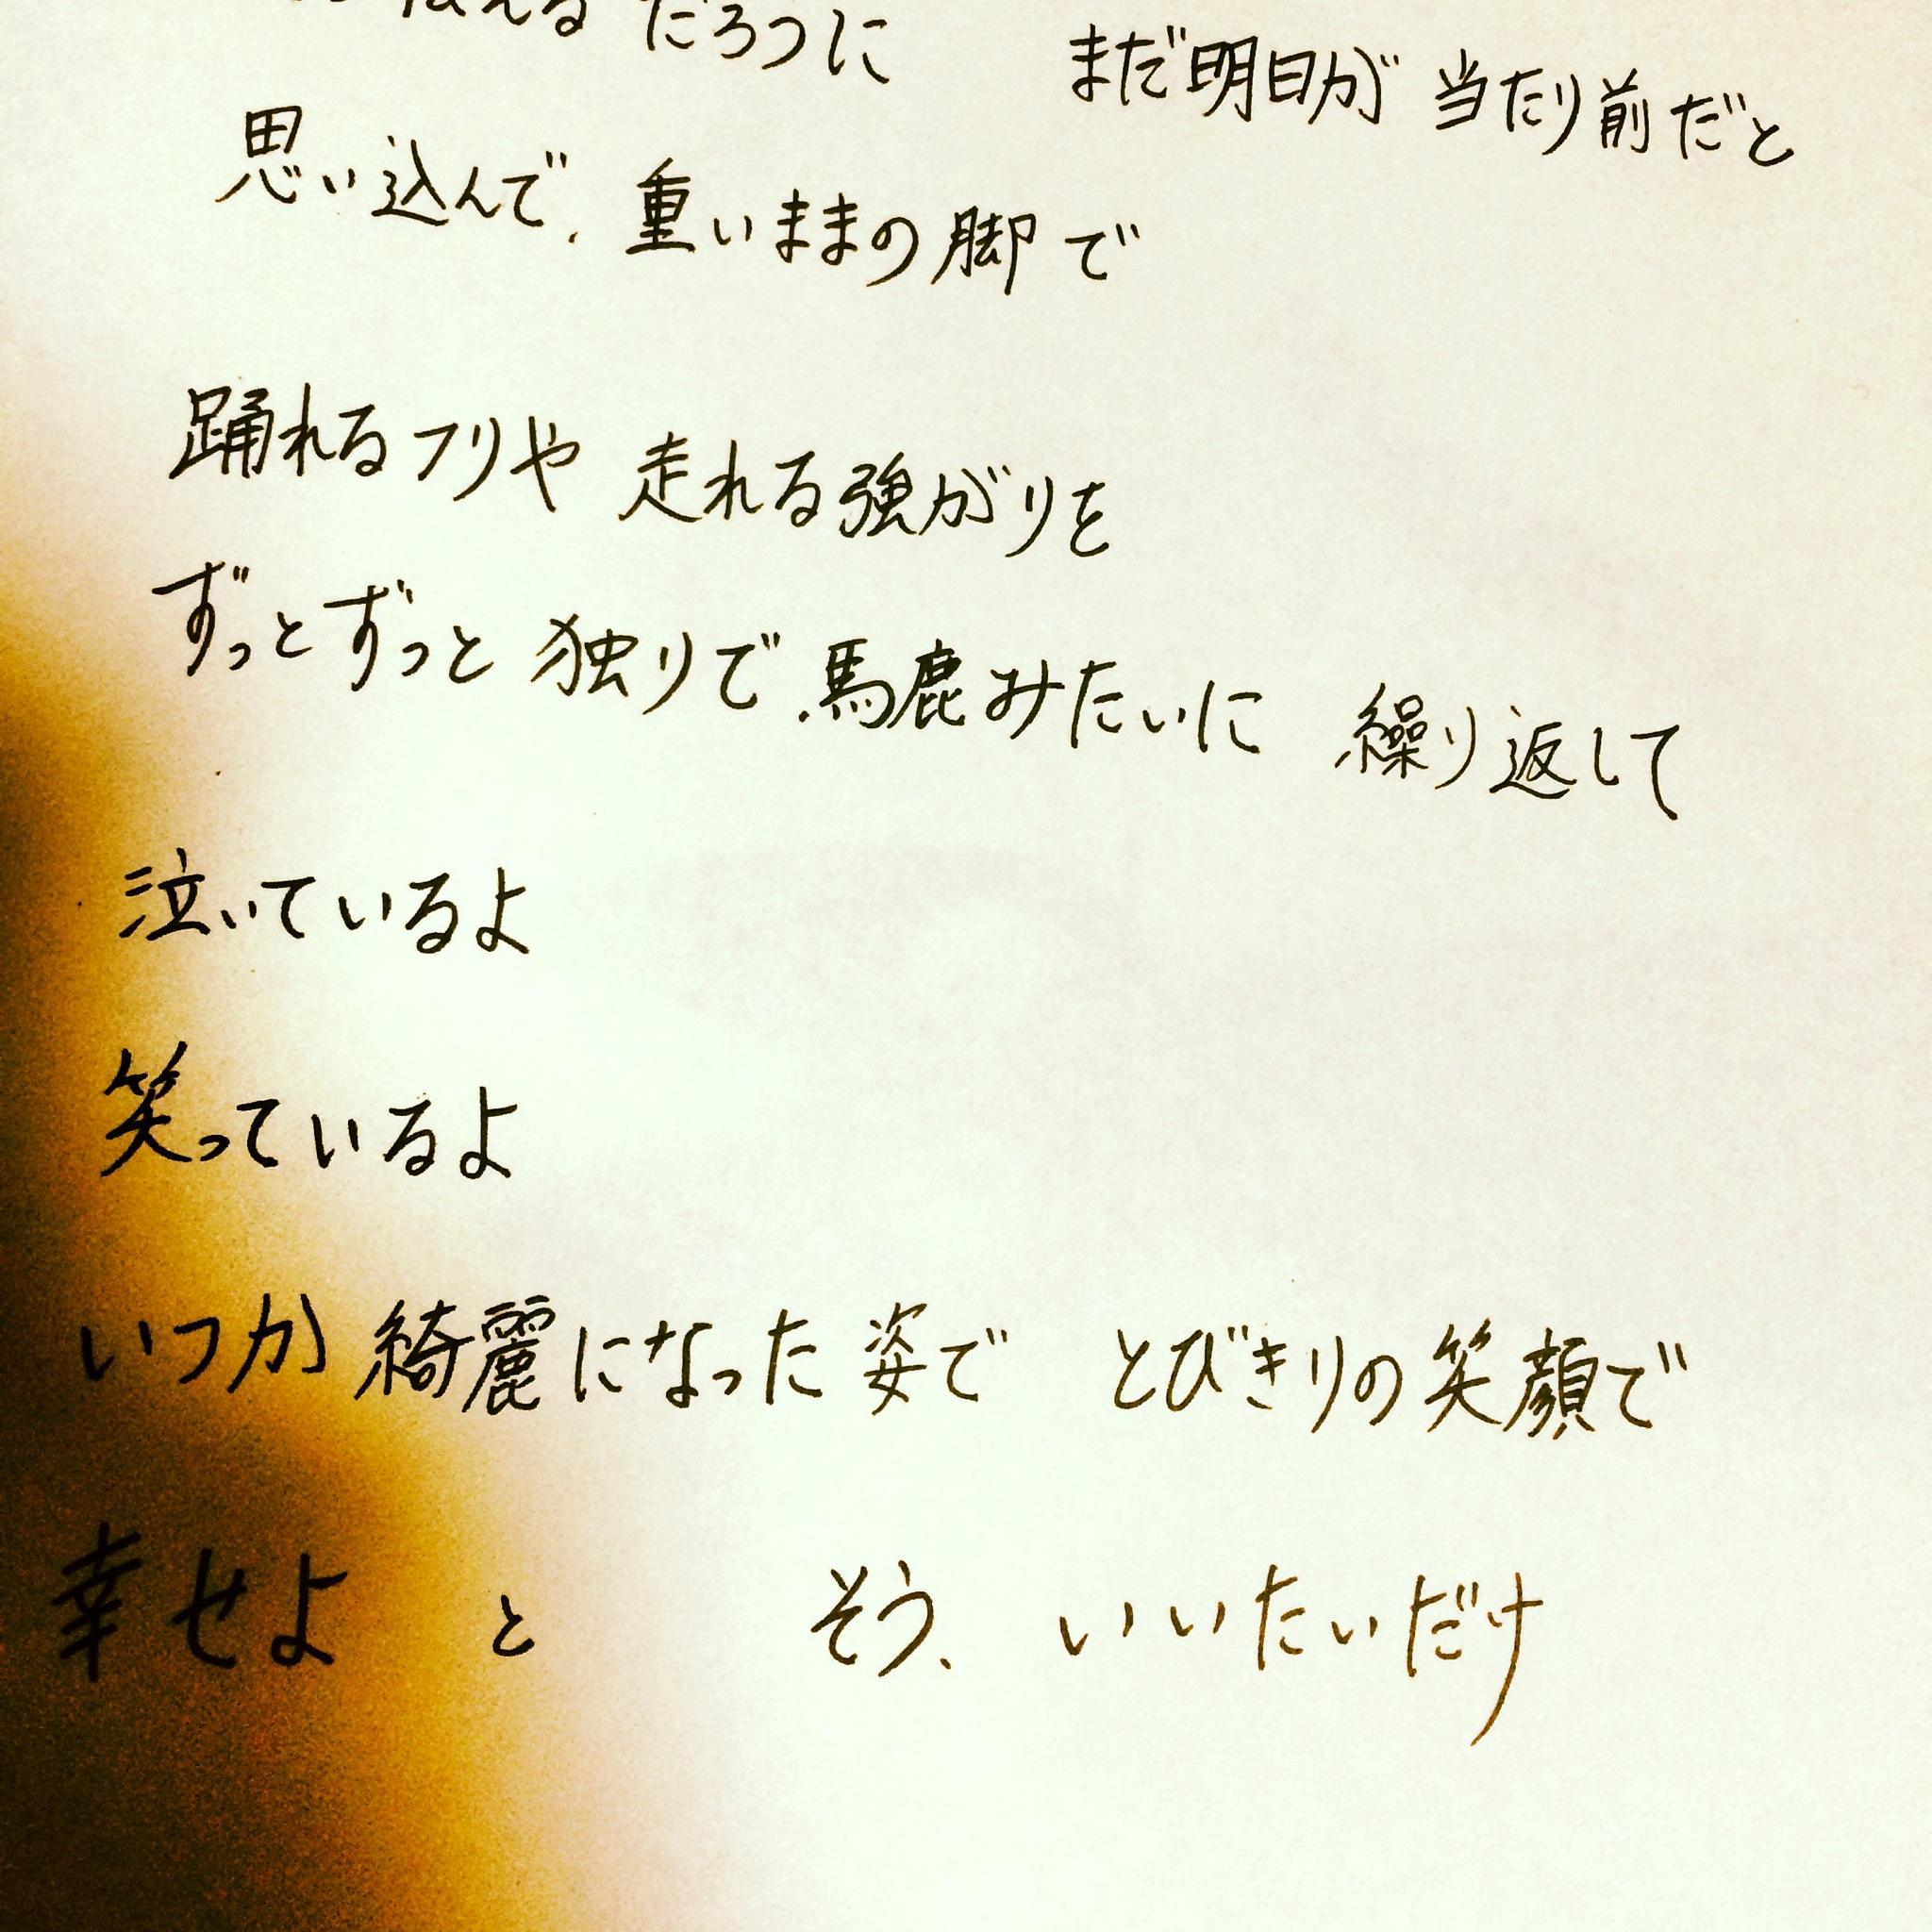 IMG_0262-1.JPG